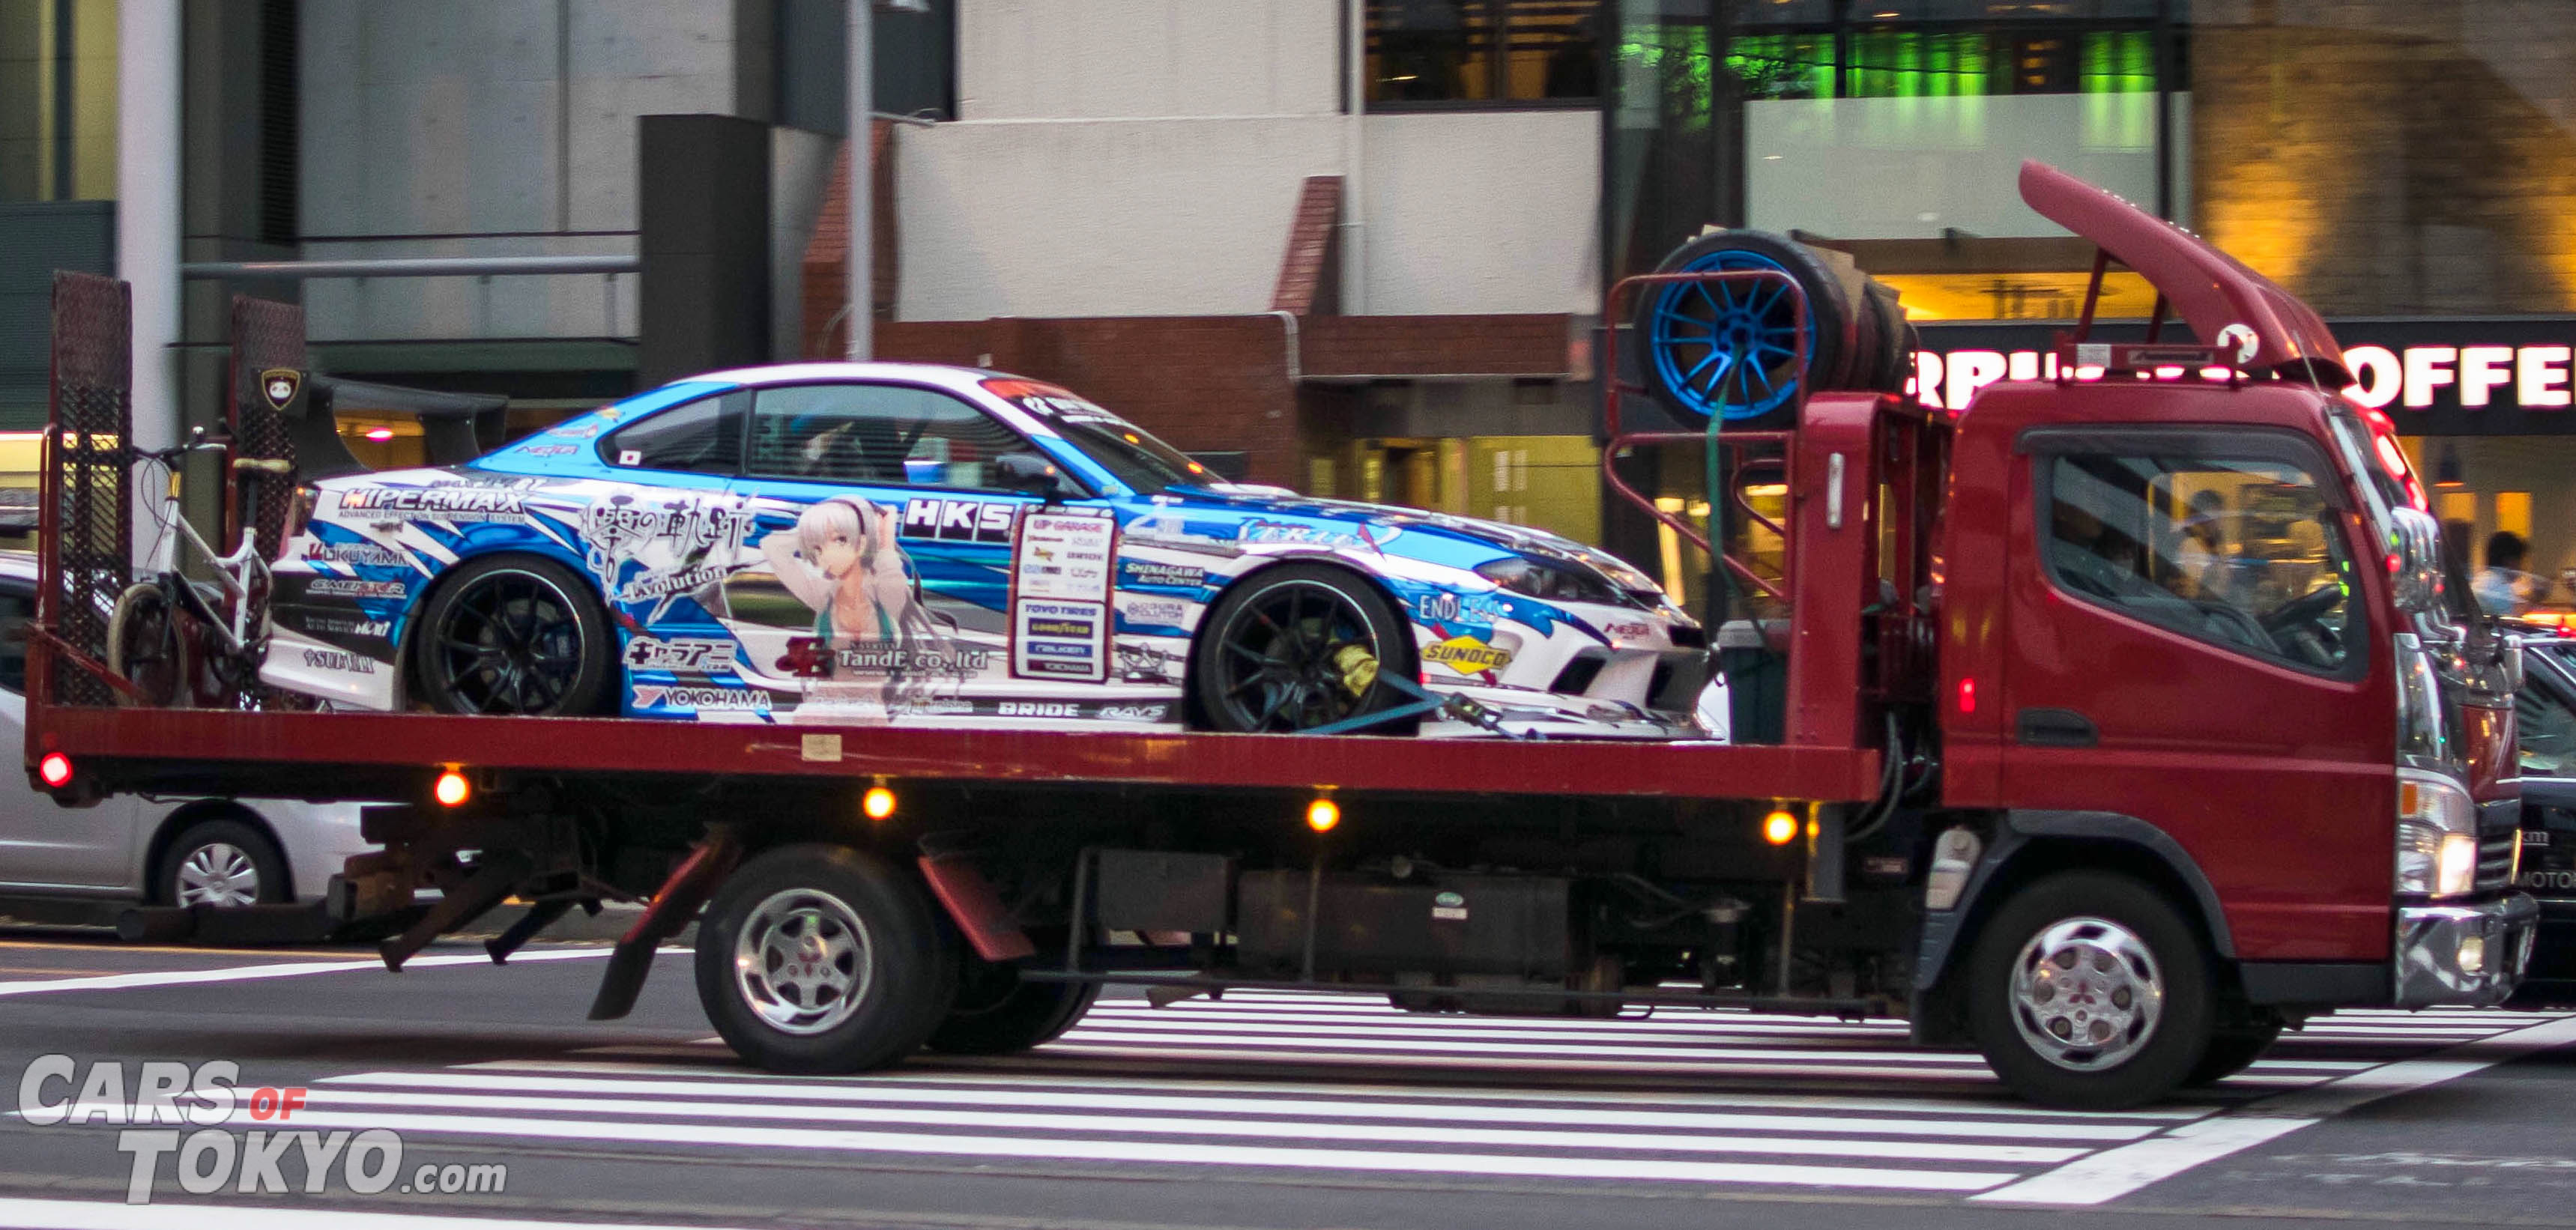 Cars of Tokyo Nissan S15 Drift